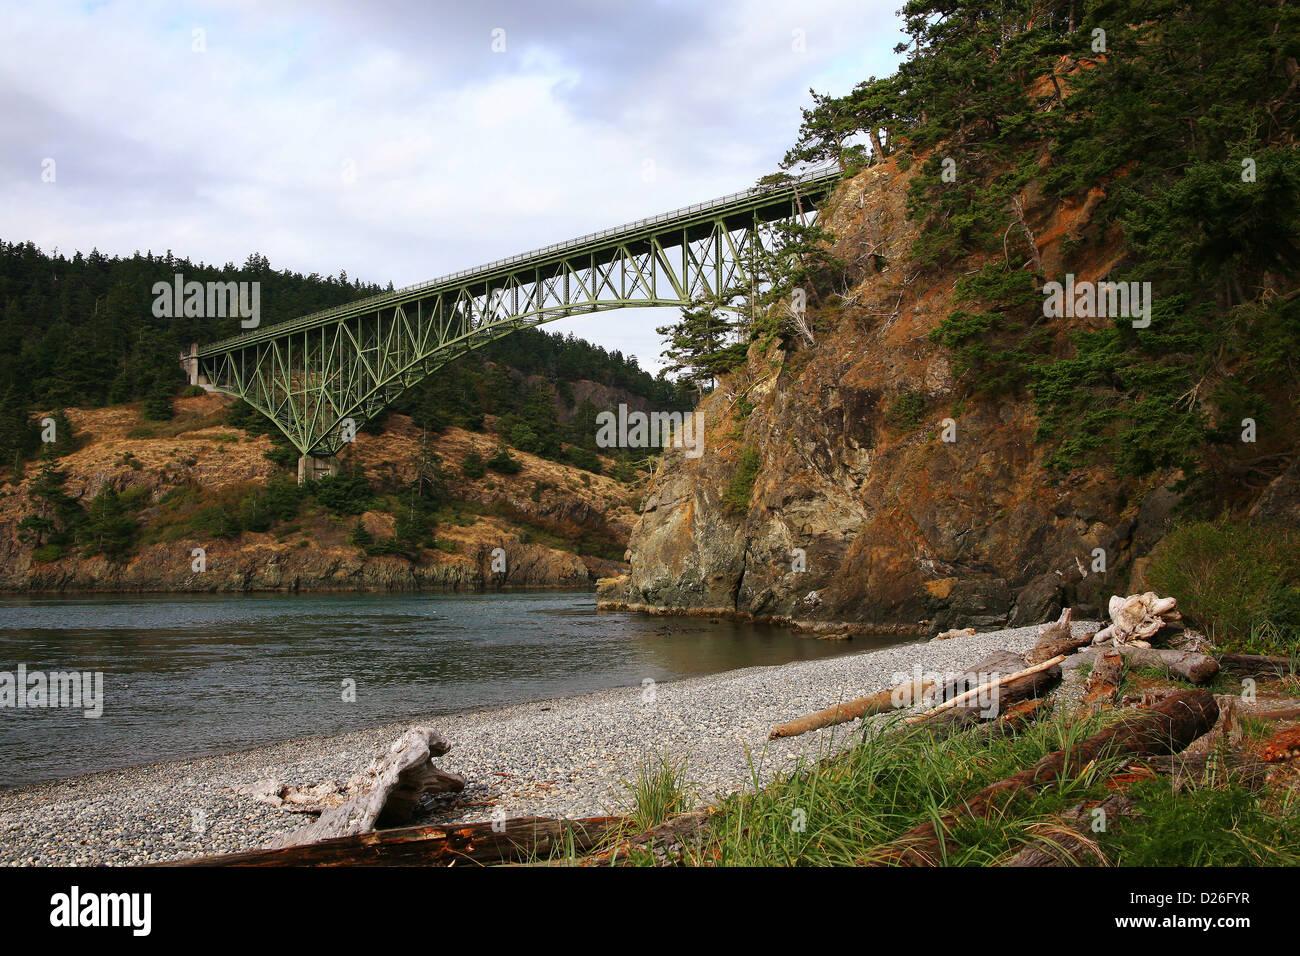 Deception Pass bridge Washington - Stock Image